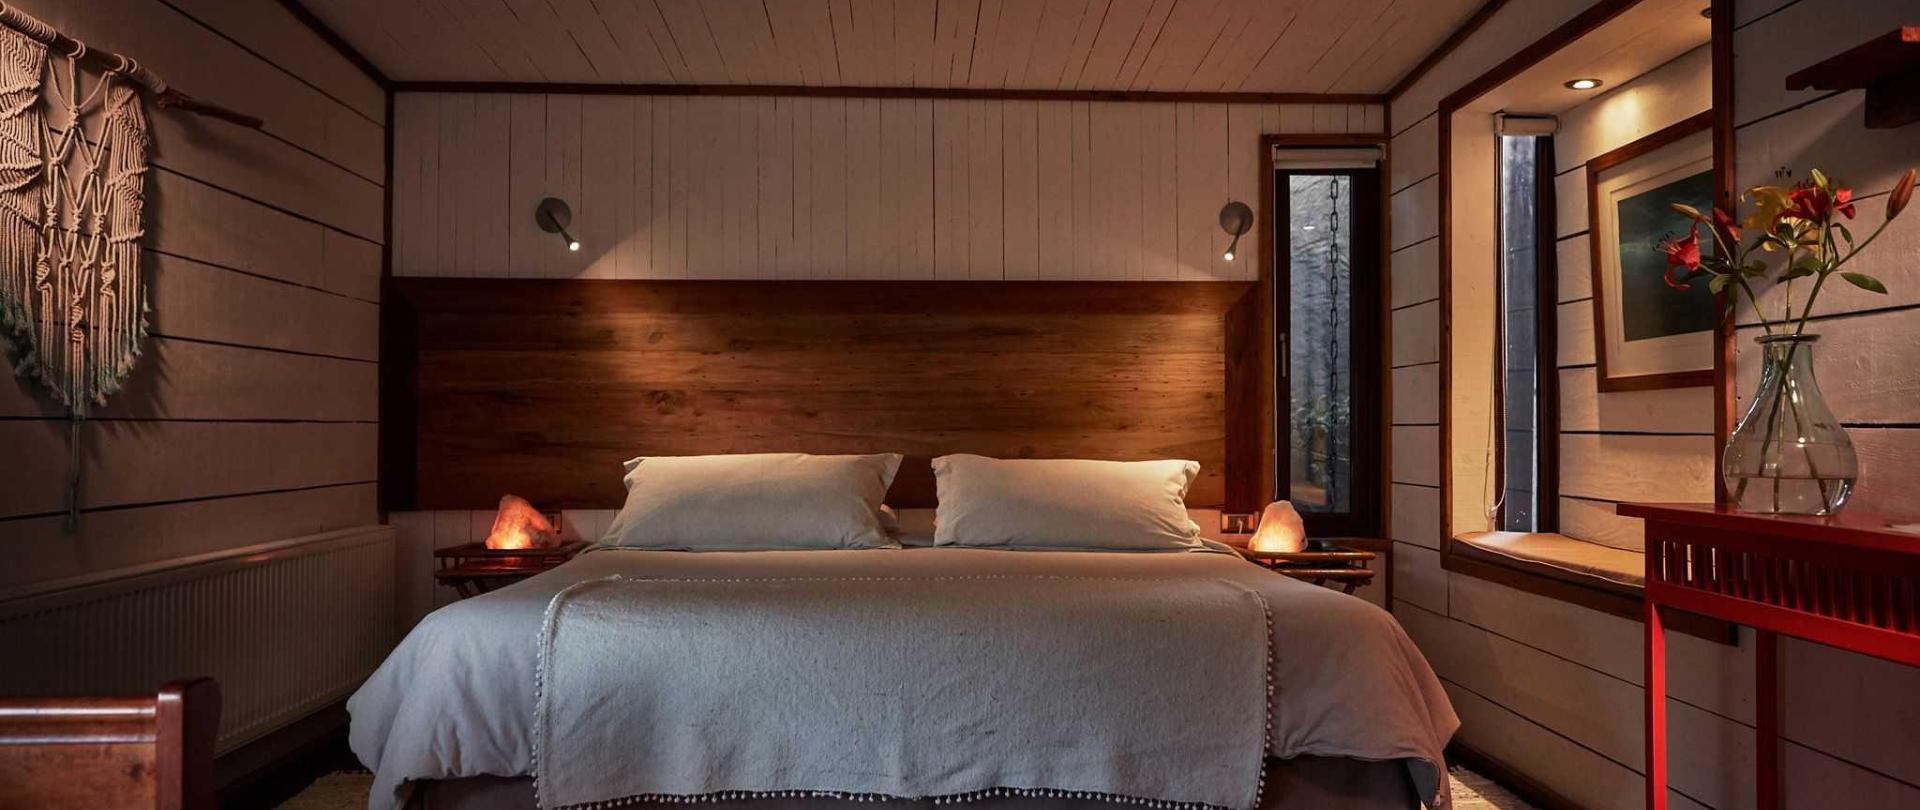 hotel-cuarzo0057.jpg